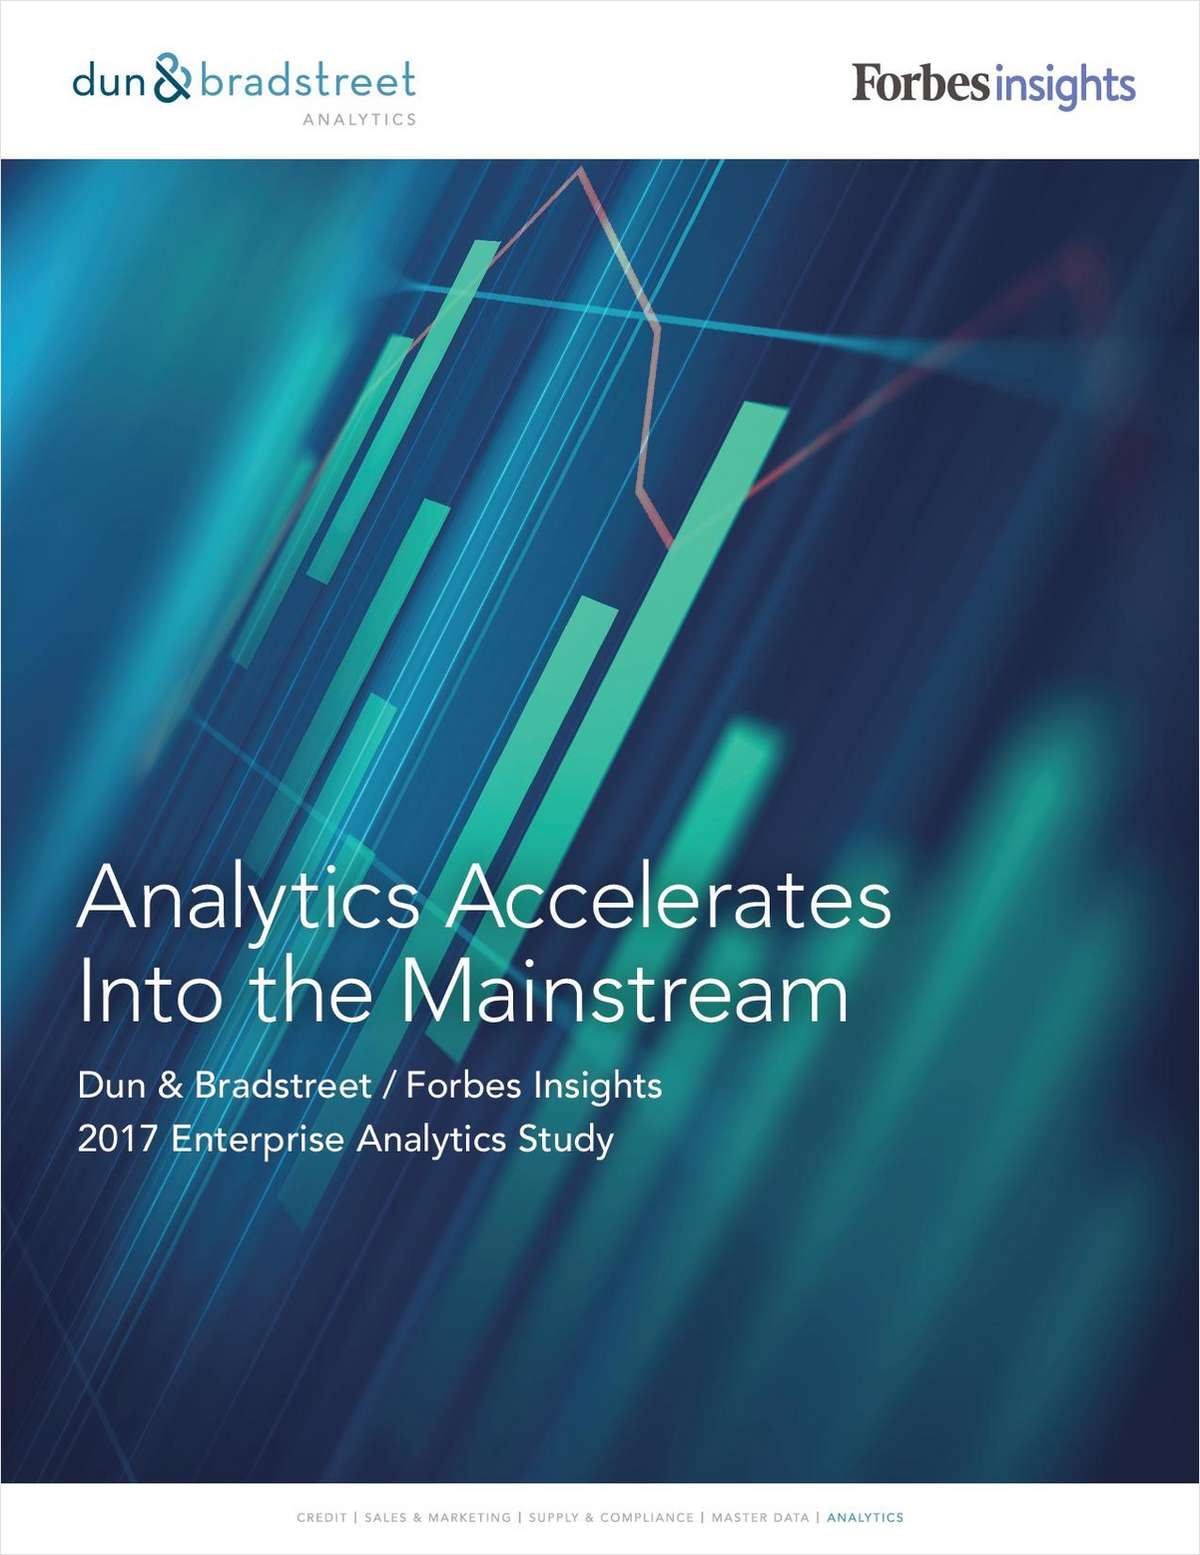 Analytics Accelerates Into the Mainstream